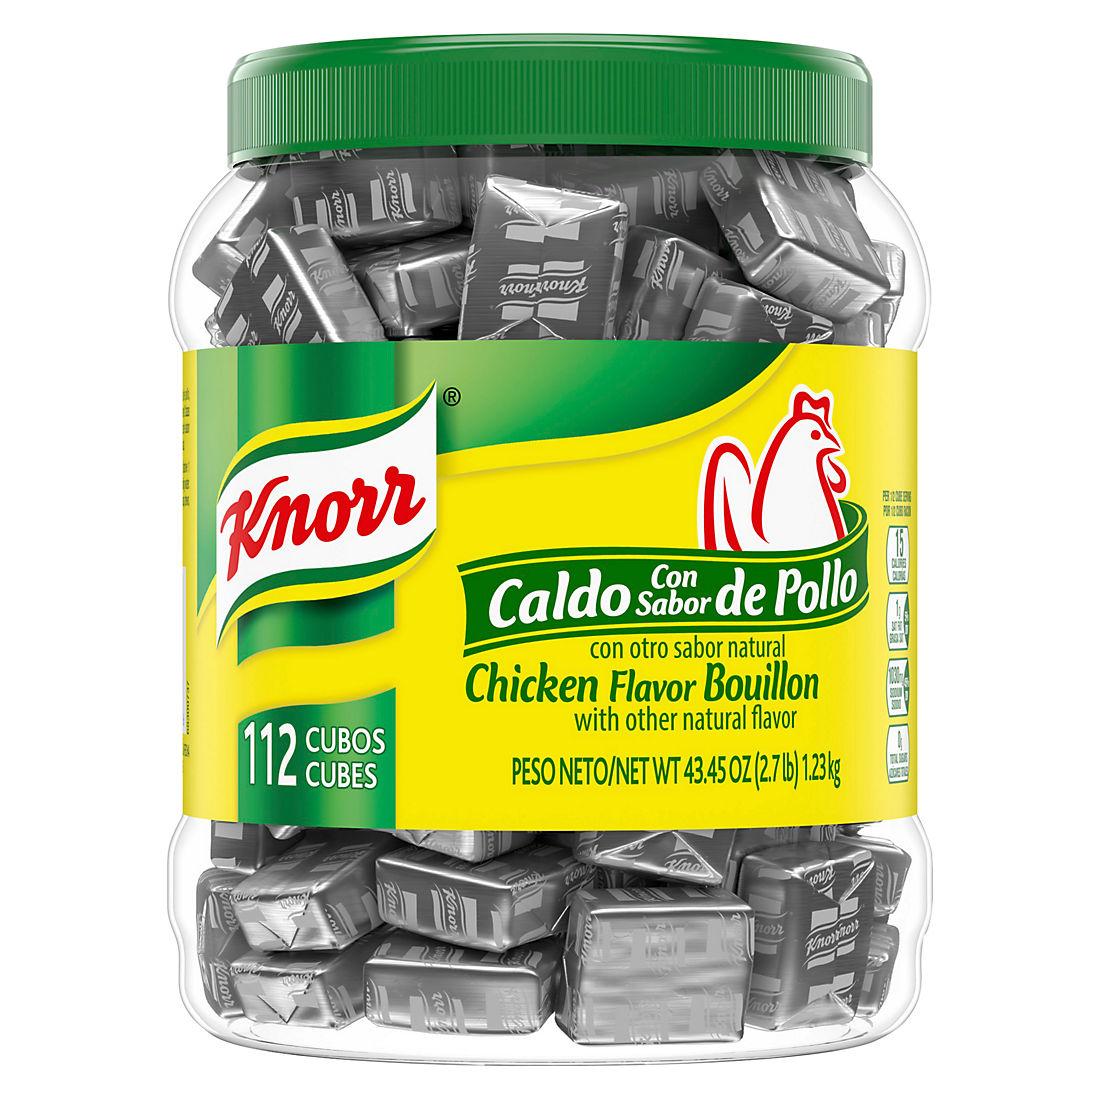 Knorr Chicken Flavor Bouillon Cubes